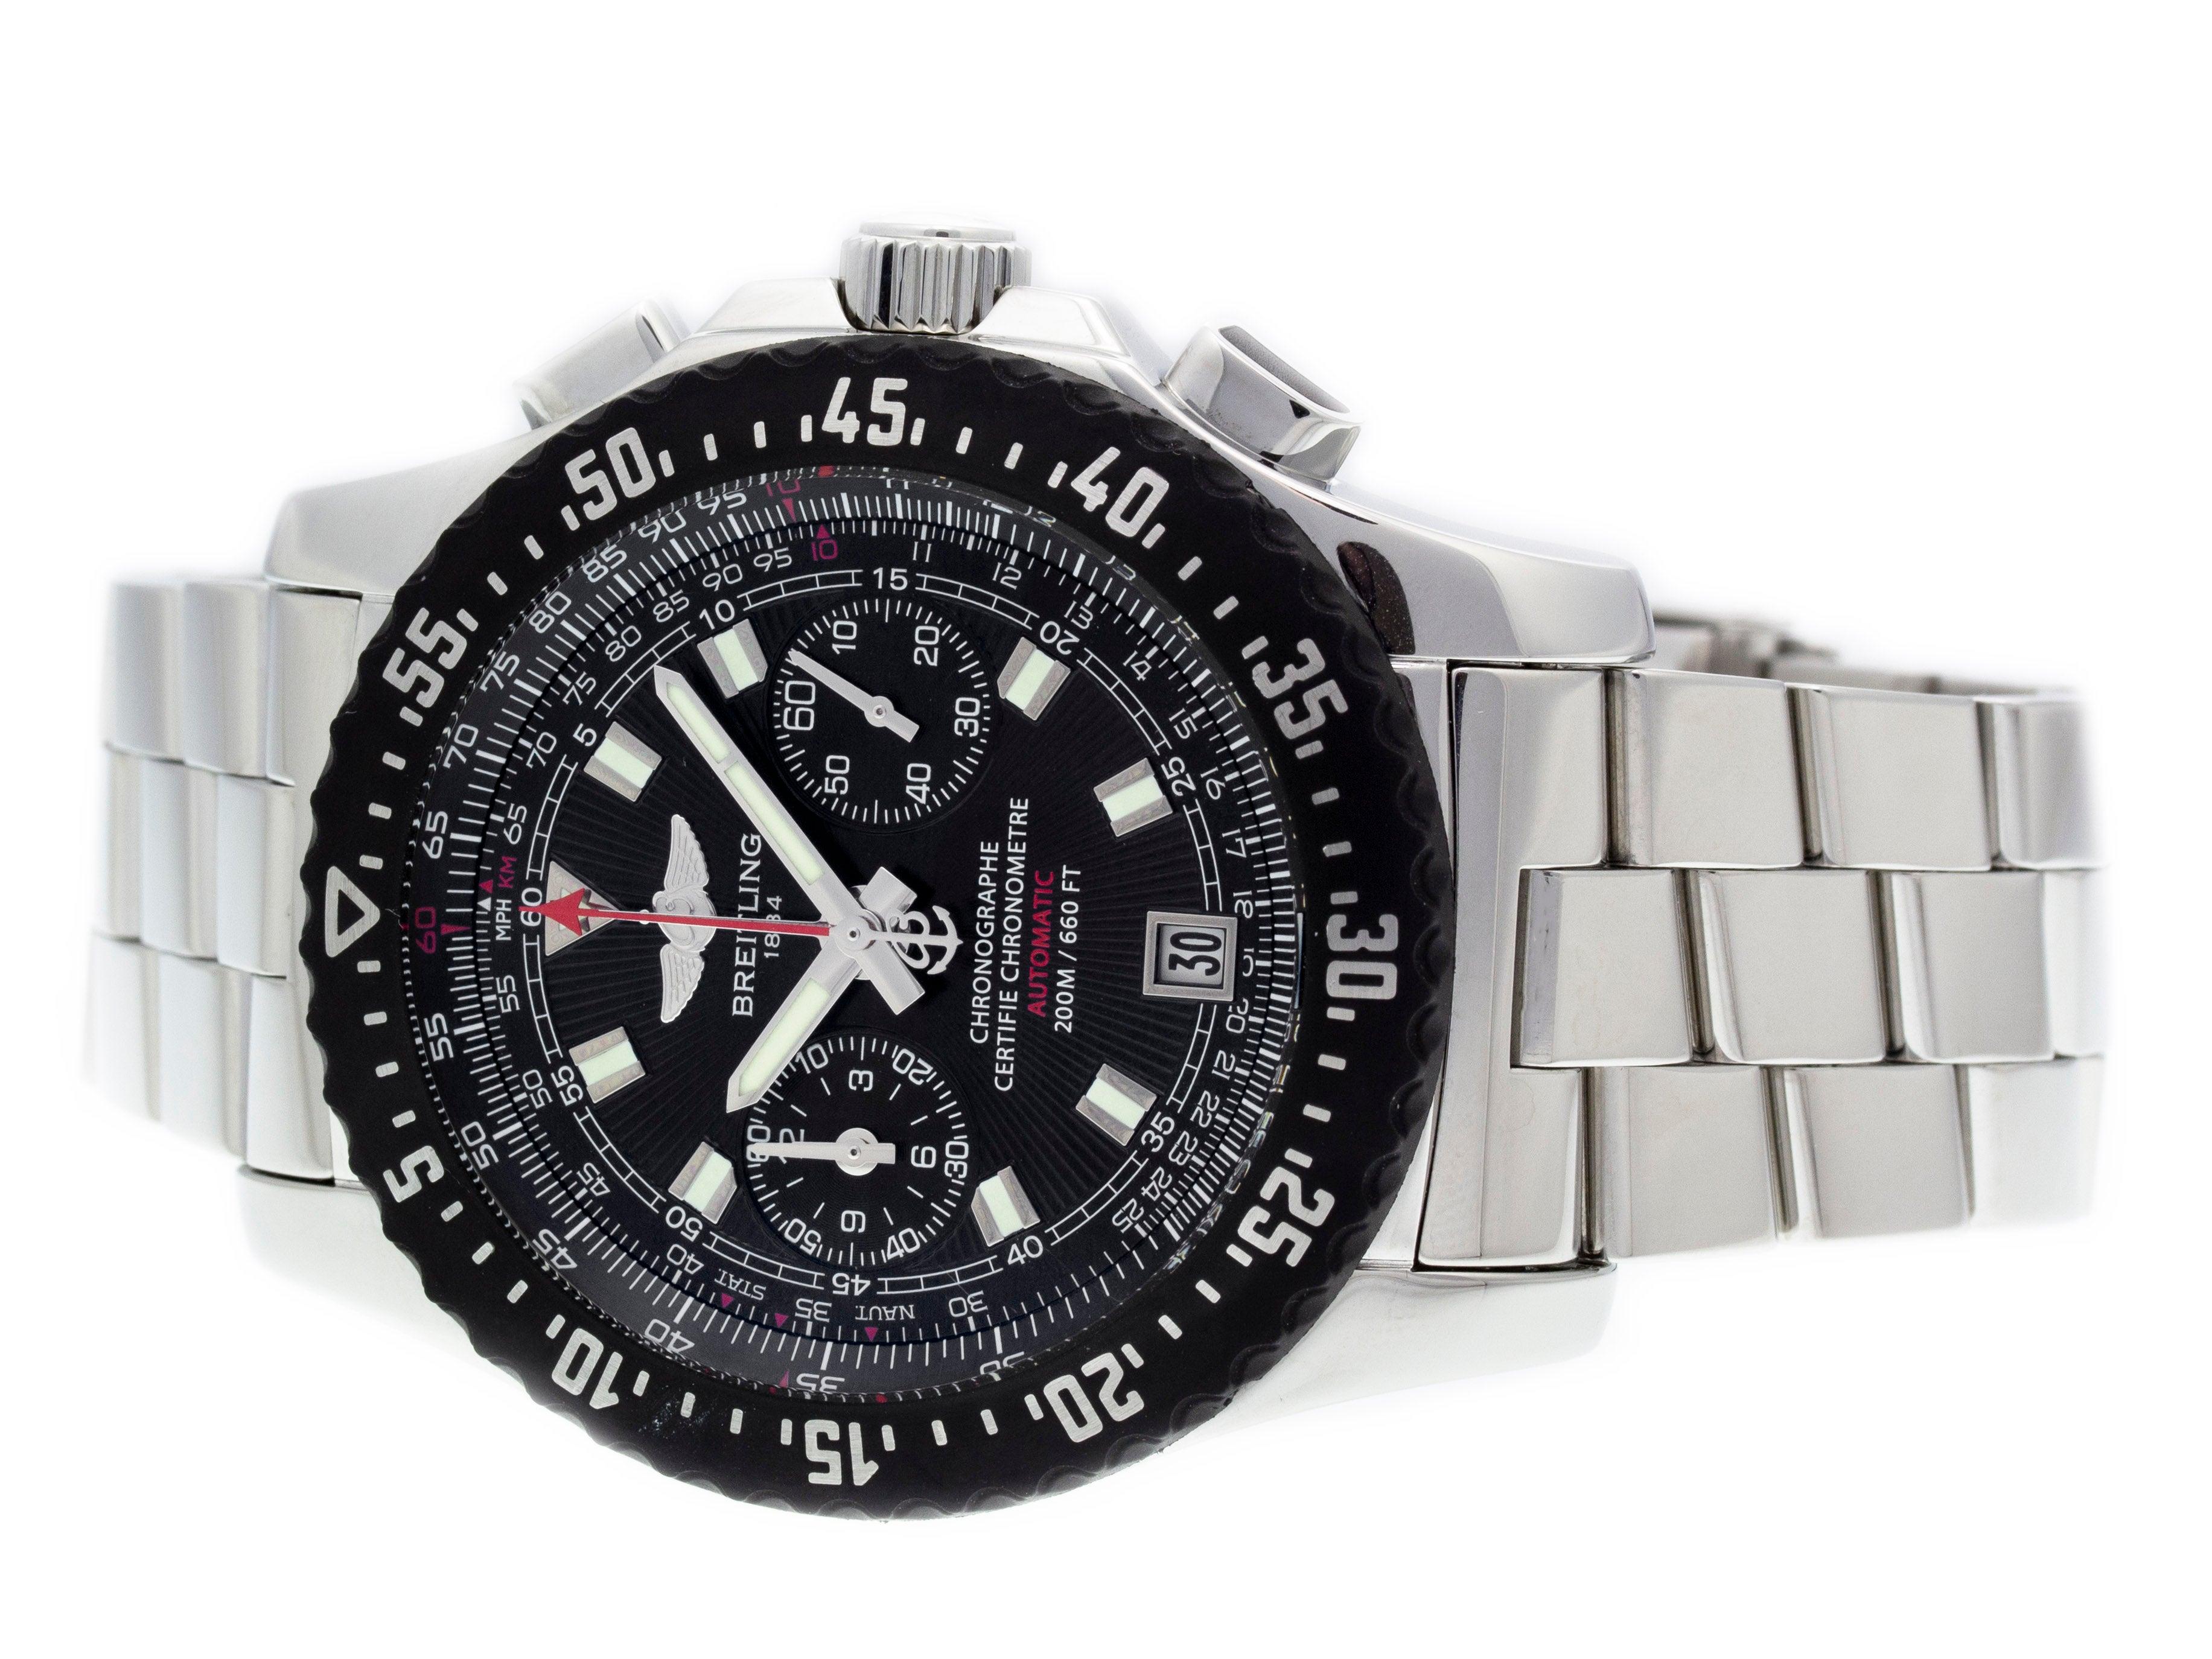 Breitling Skyracer Raven A2736423 B823